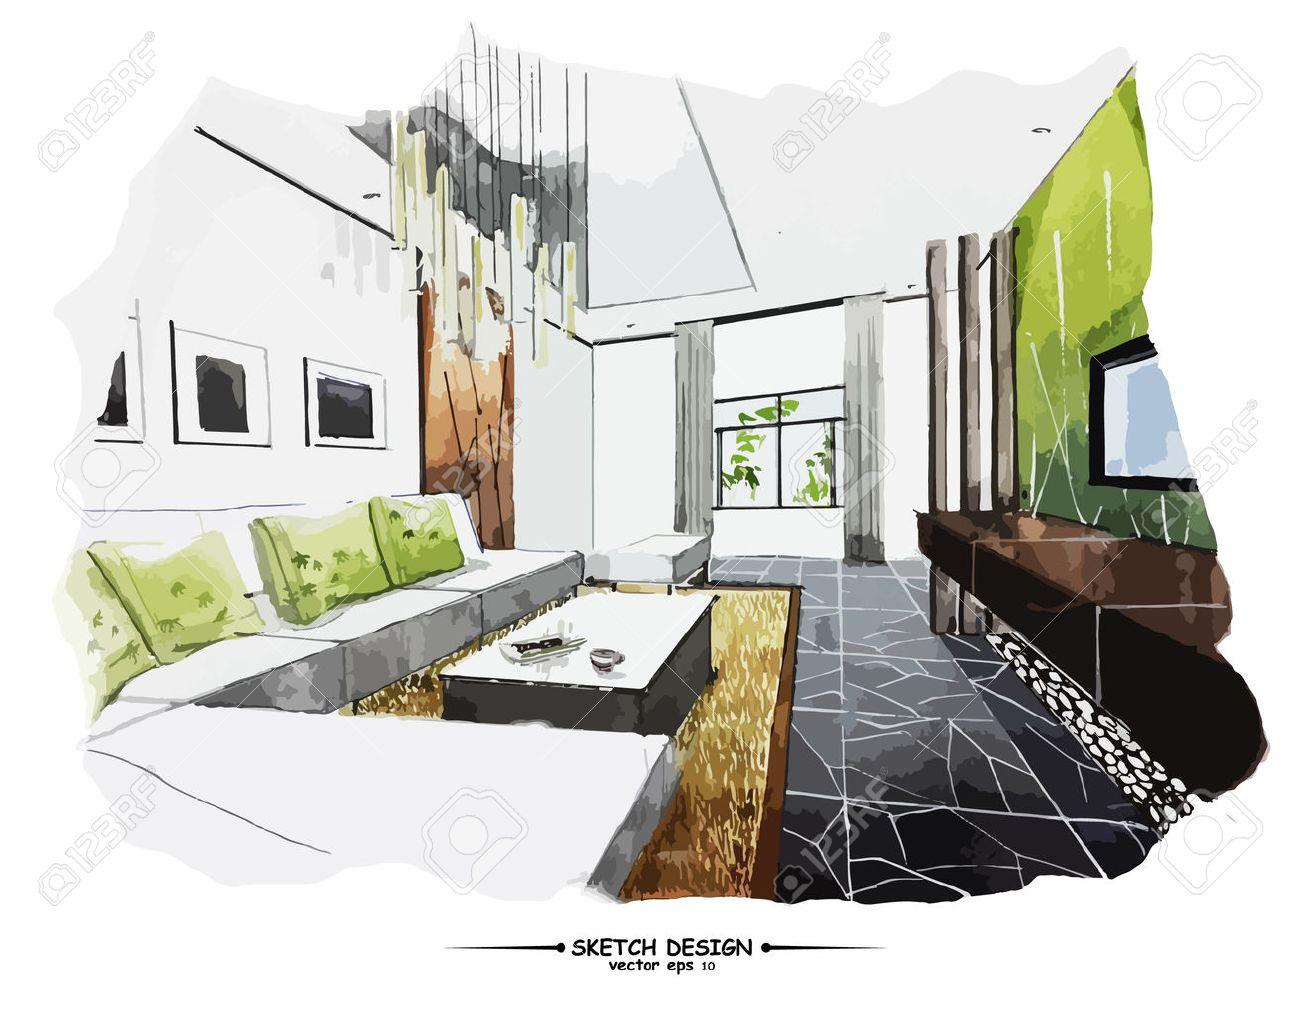 Vector interior sketch design. Watercolor sketching idea on white paper background. - 45570326